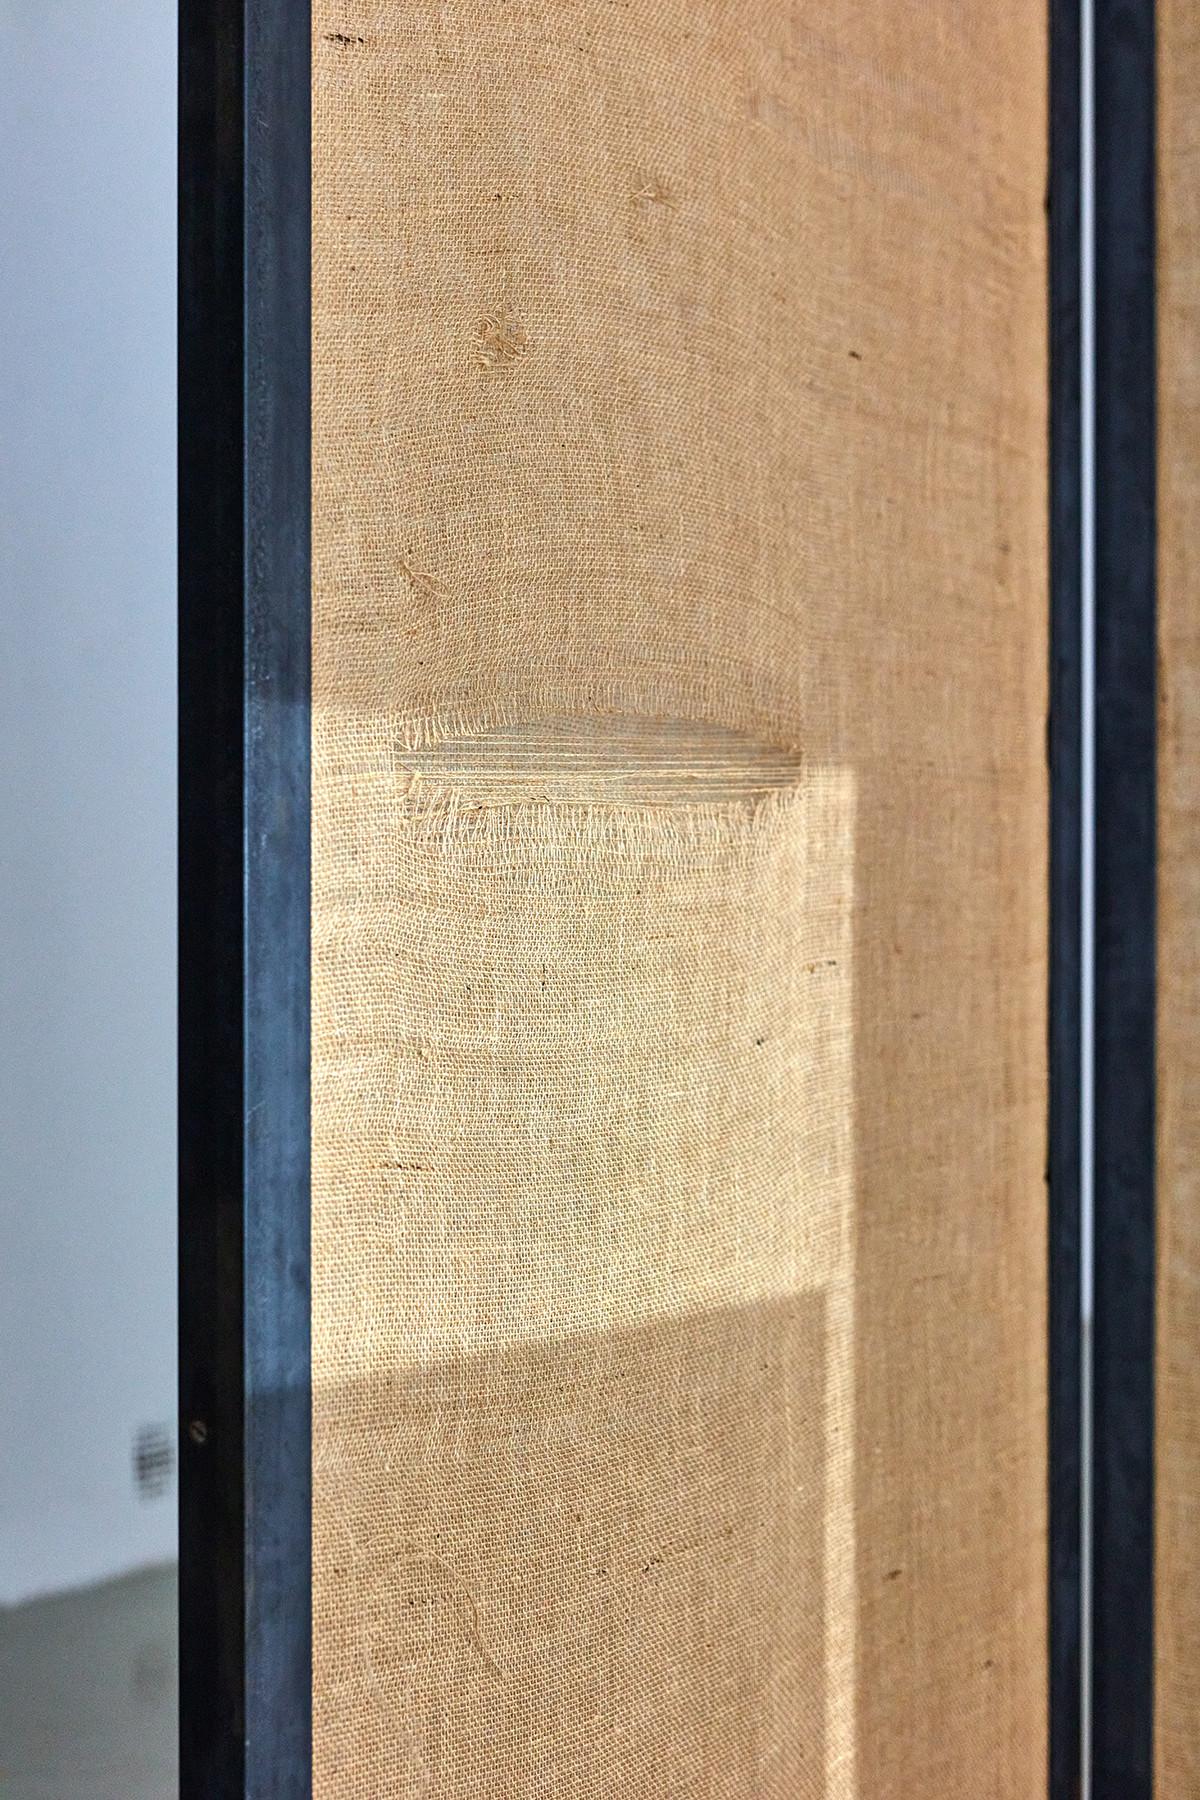 Roman Štětina: Untitled (Speak so I can see you), 2020. installation (jute, iron, wood) (detail) | photo: Dávid Biró